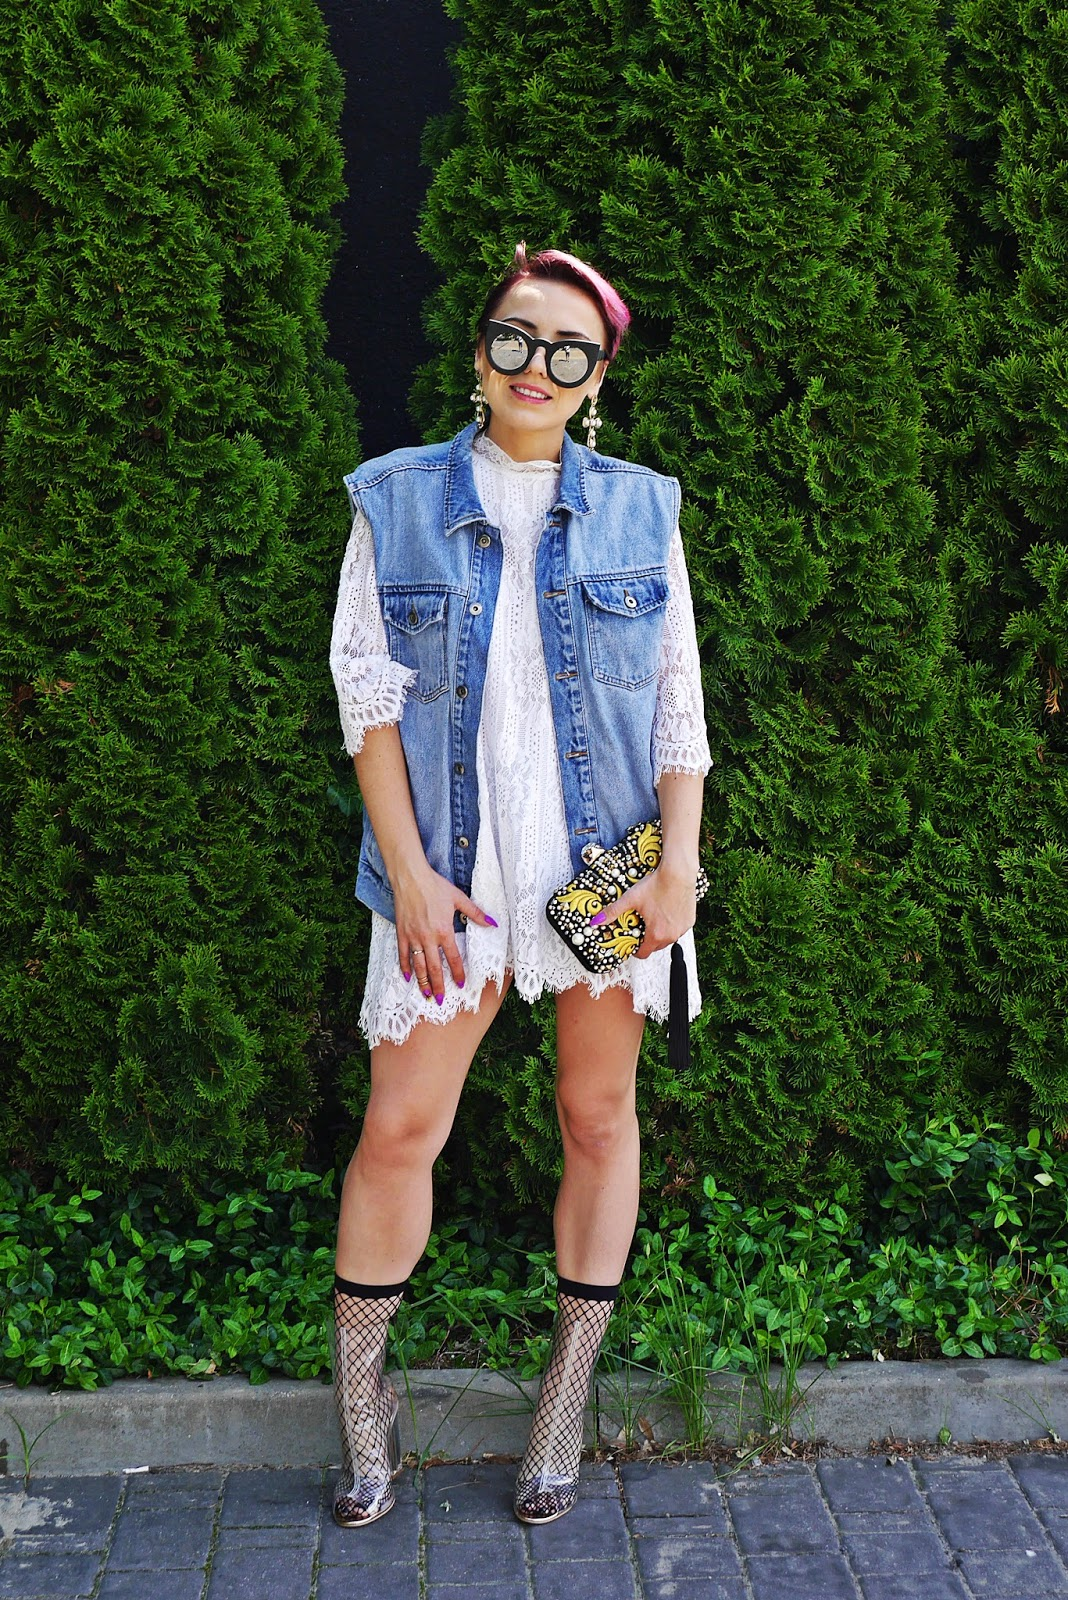 lace_dress_transparent_yezzy_shoes_karyn_blog_modowy_oversize_denim_220617